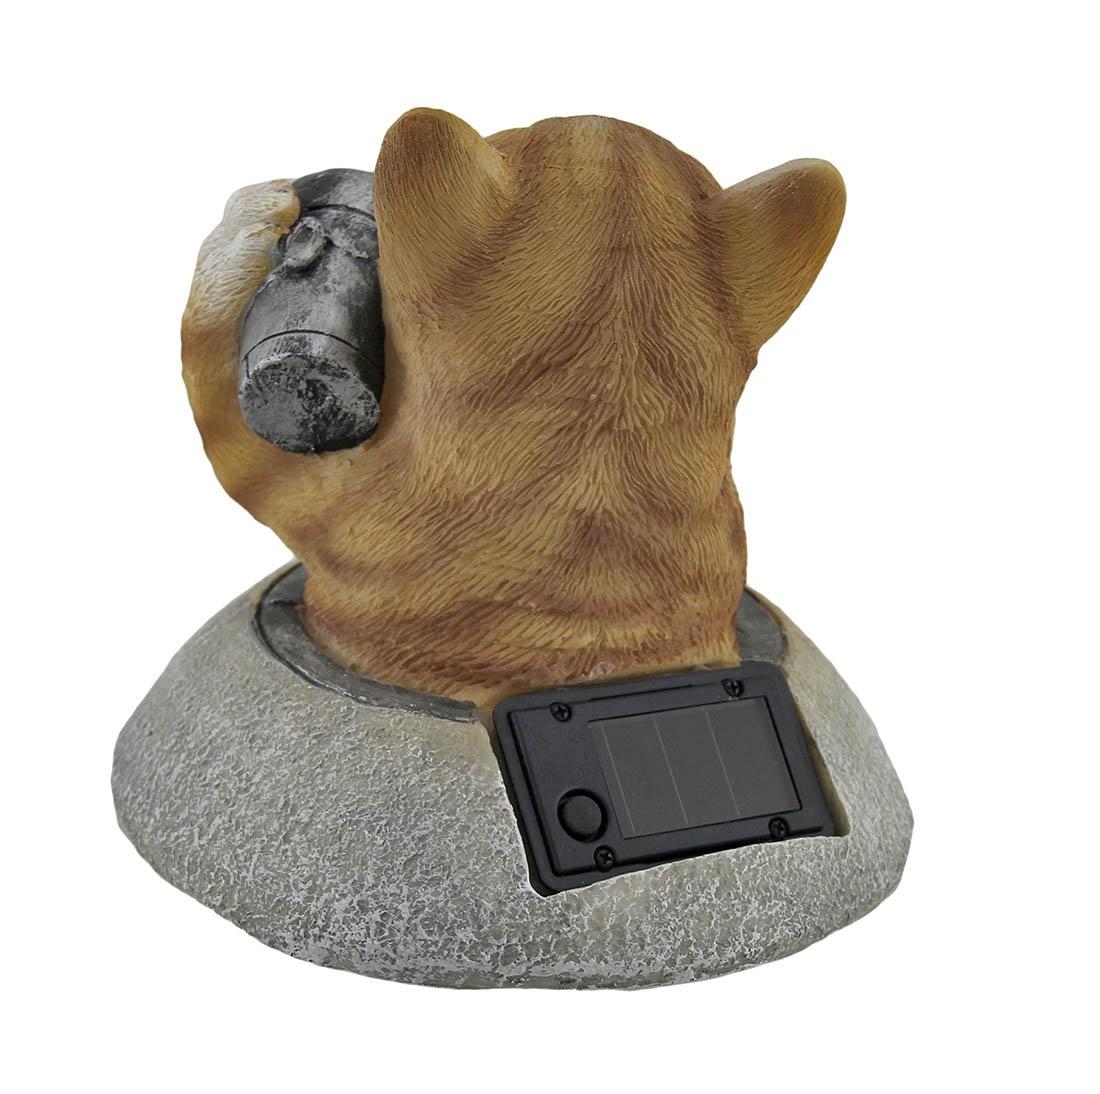 Cat Statues Homeware: Buy Online from Fishpond.com.au